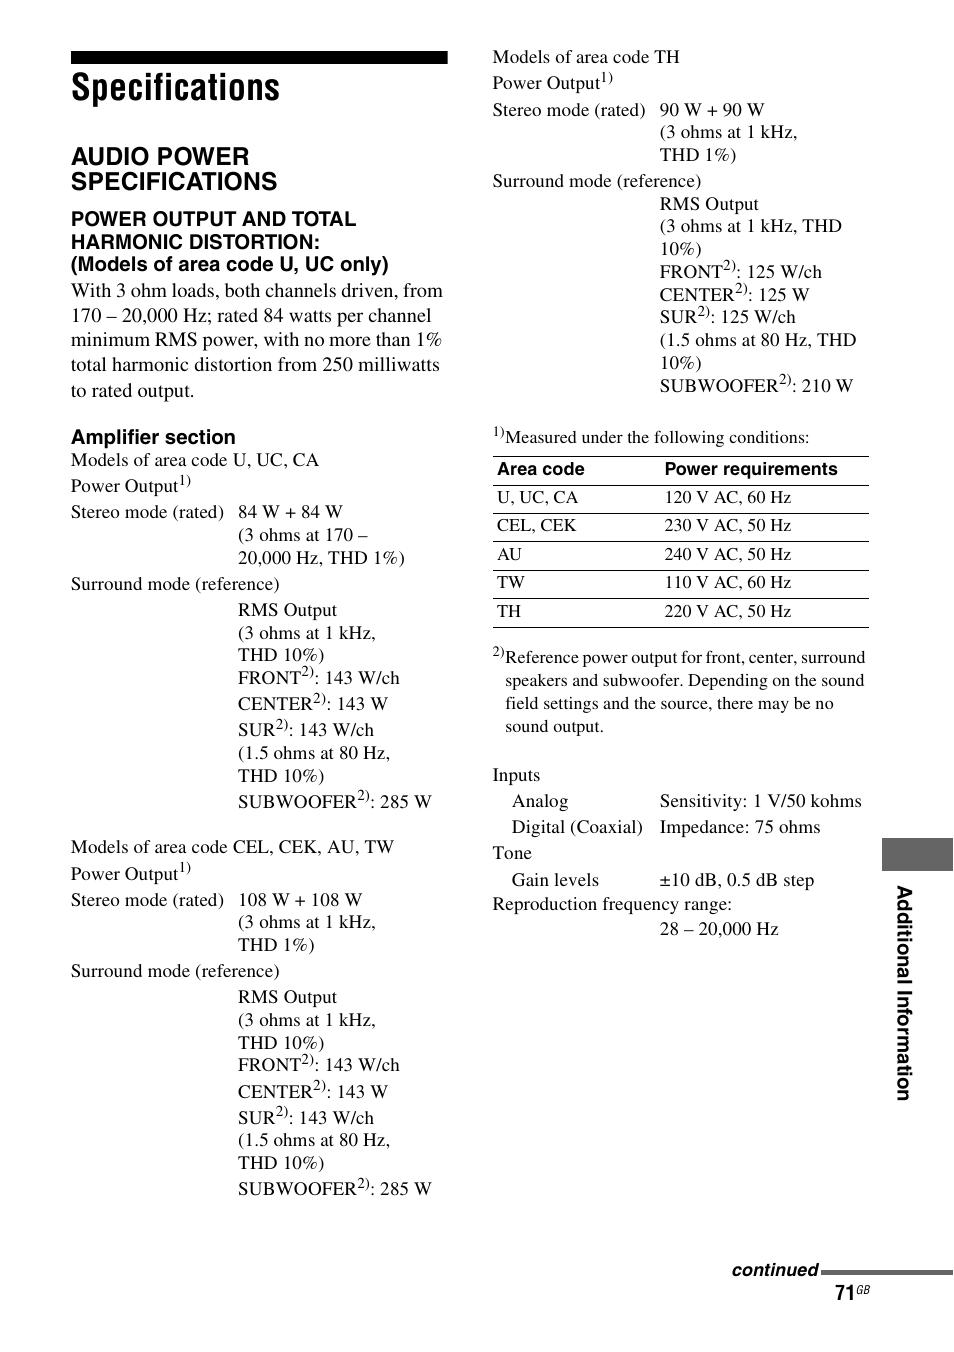 Specifications, Audio power specifications | Sony STR-KS2300